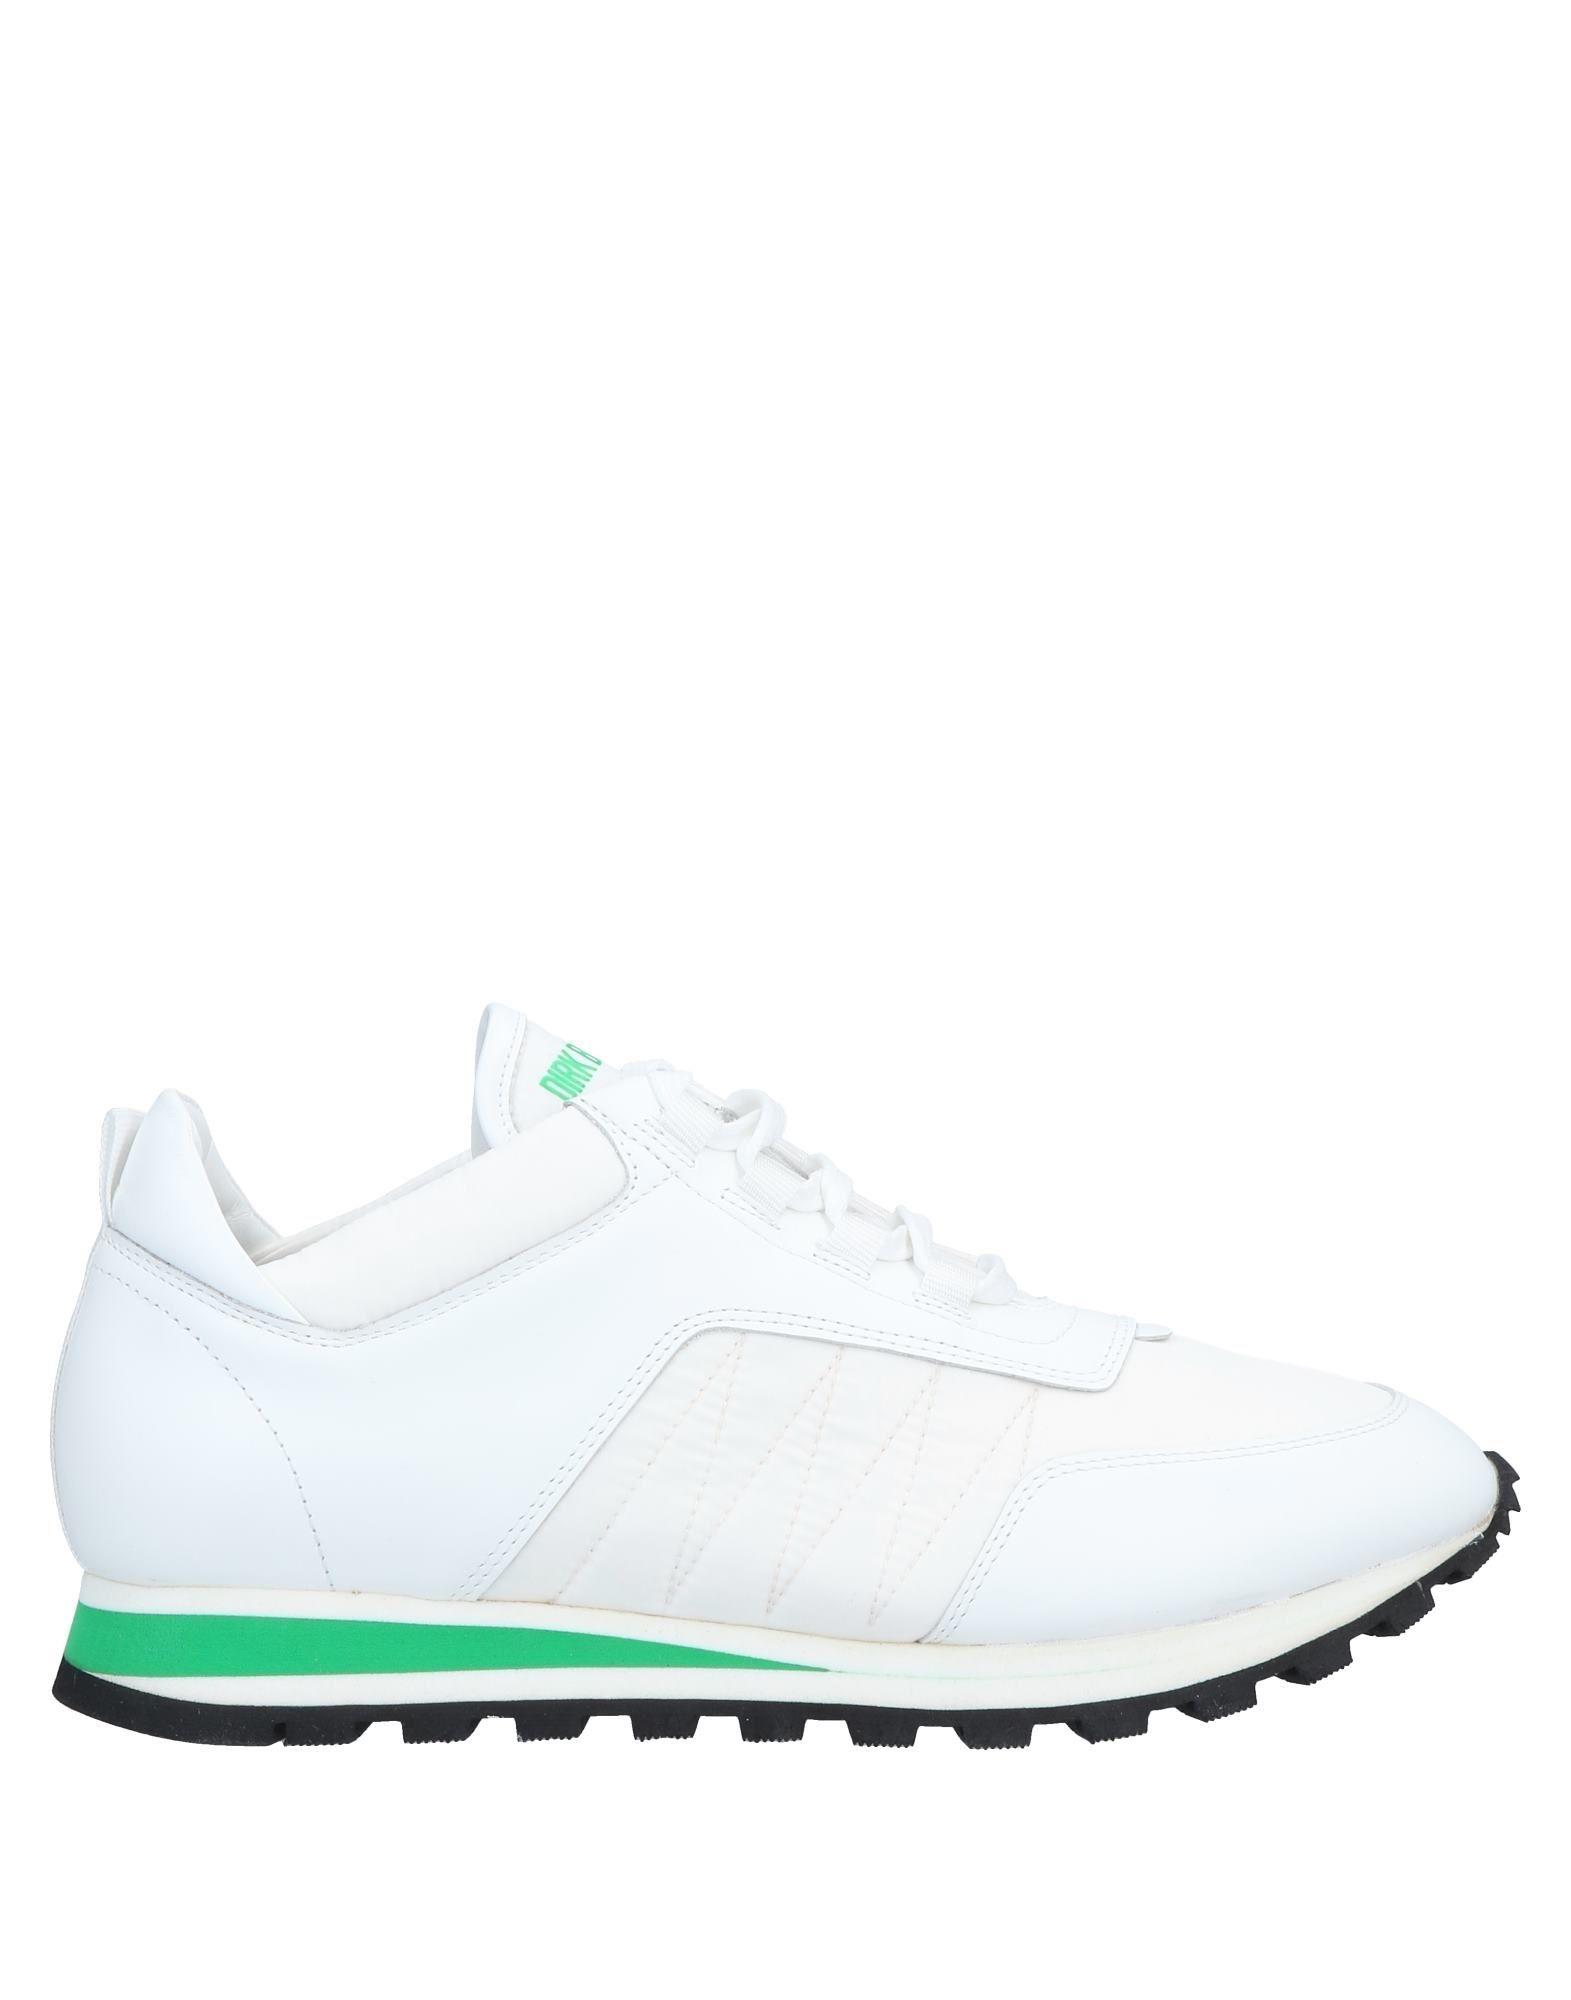 Dirk Bikkembergs Sneakers - Men Dirk Bikkembergs Sneakers online 11569634PL on  Canada - 11569634PL online c82667